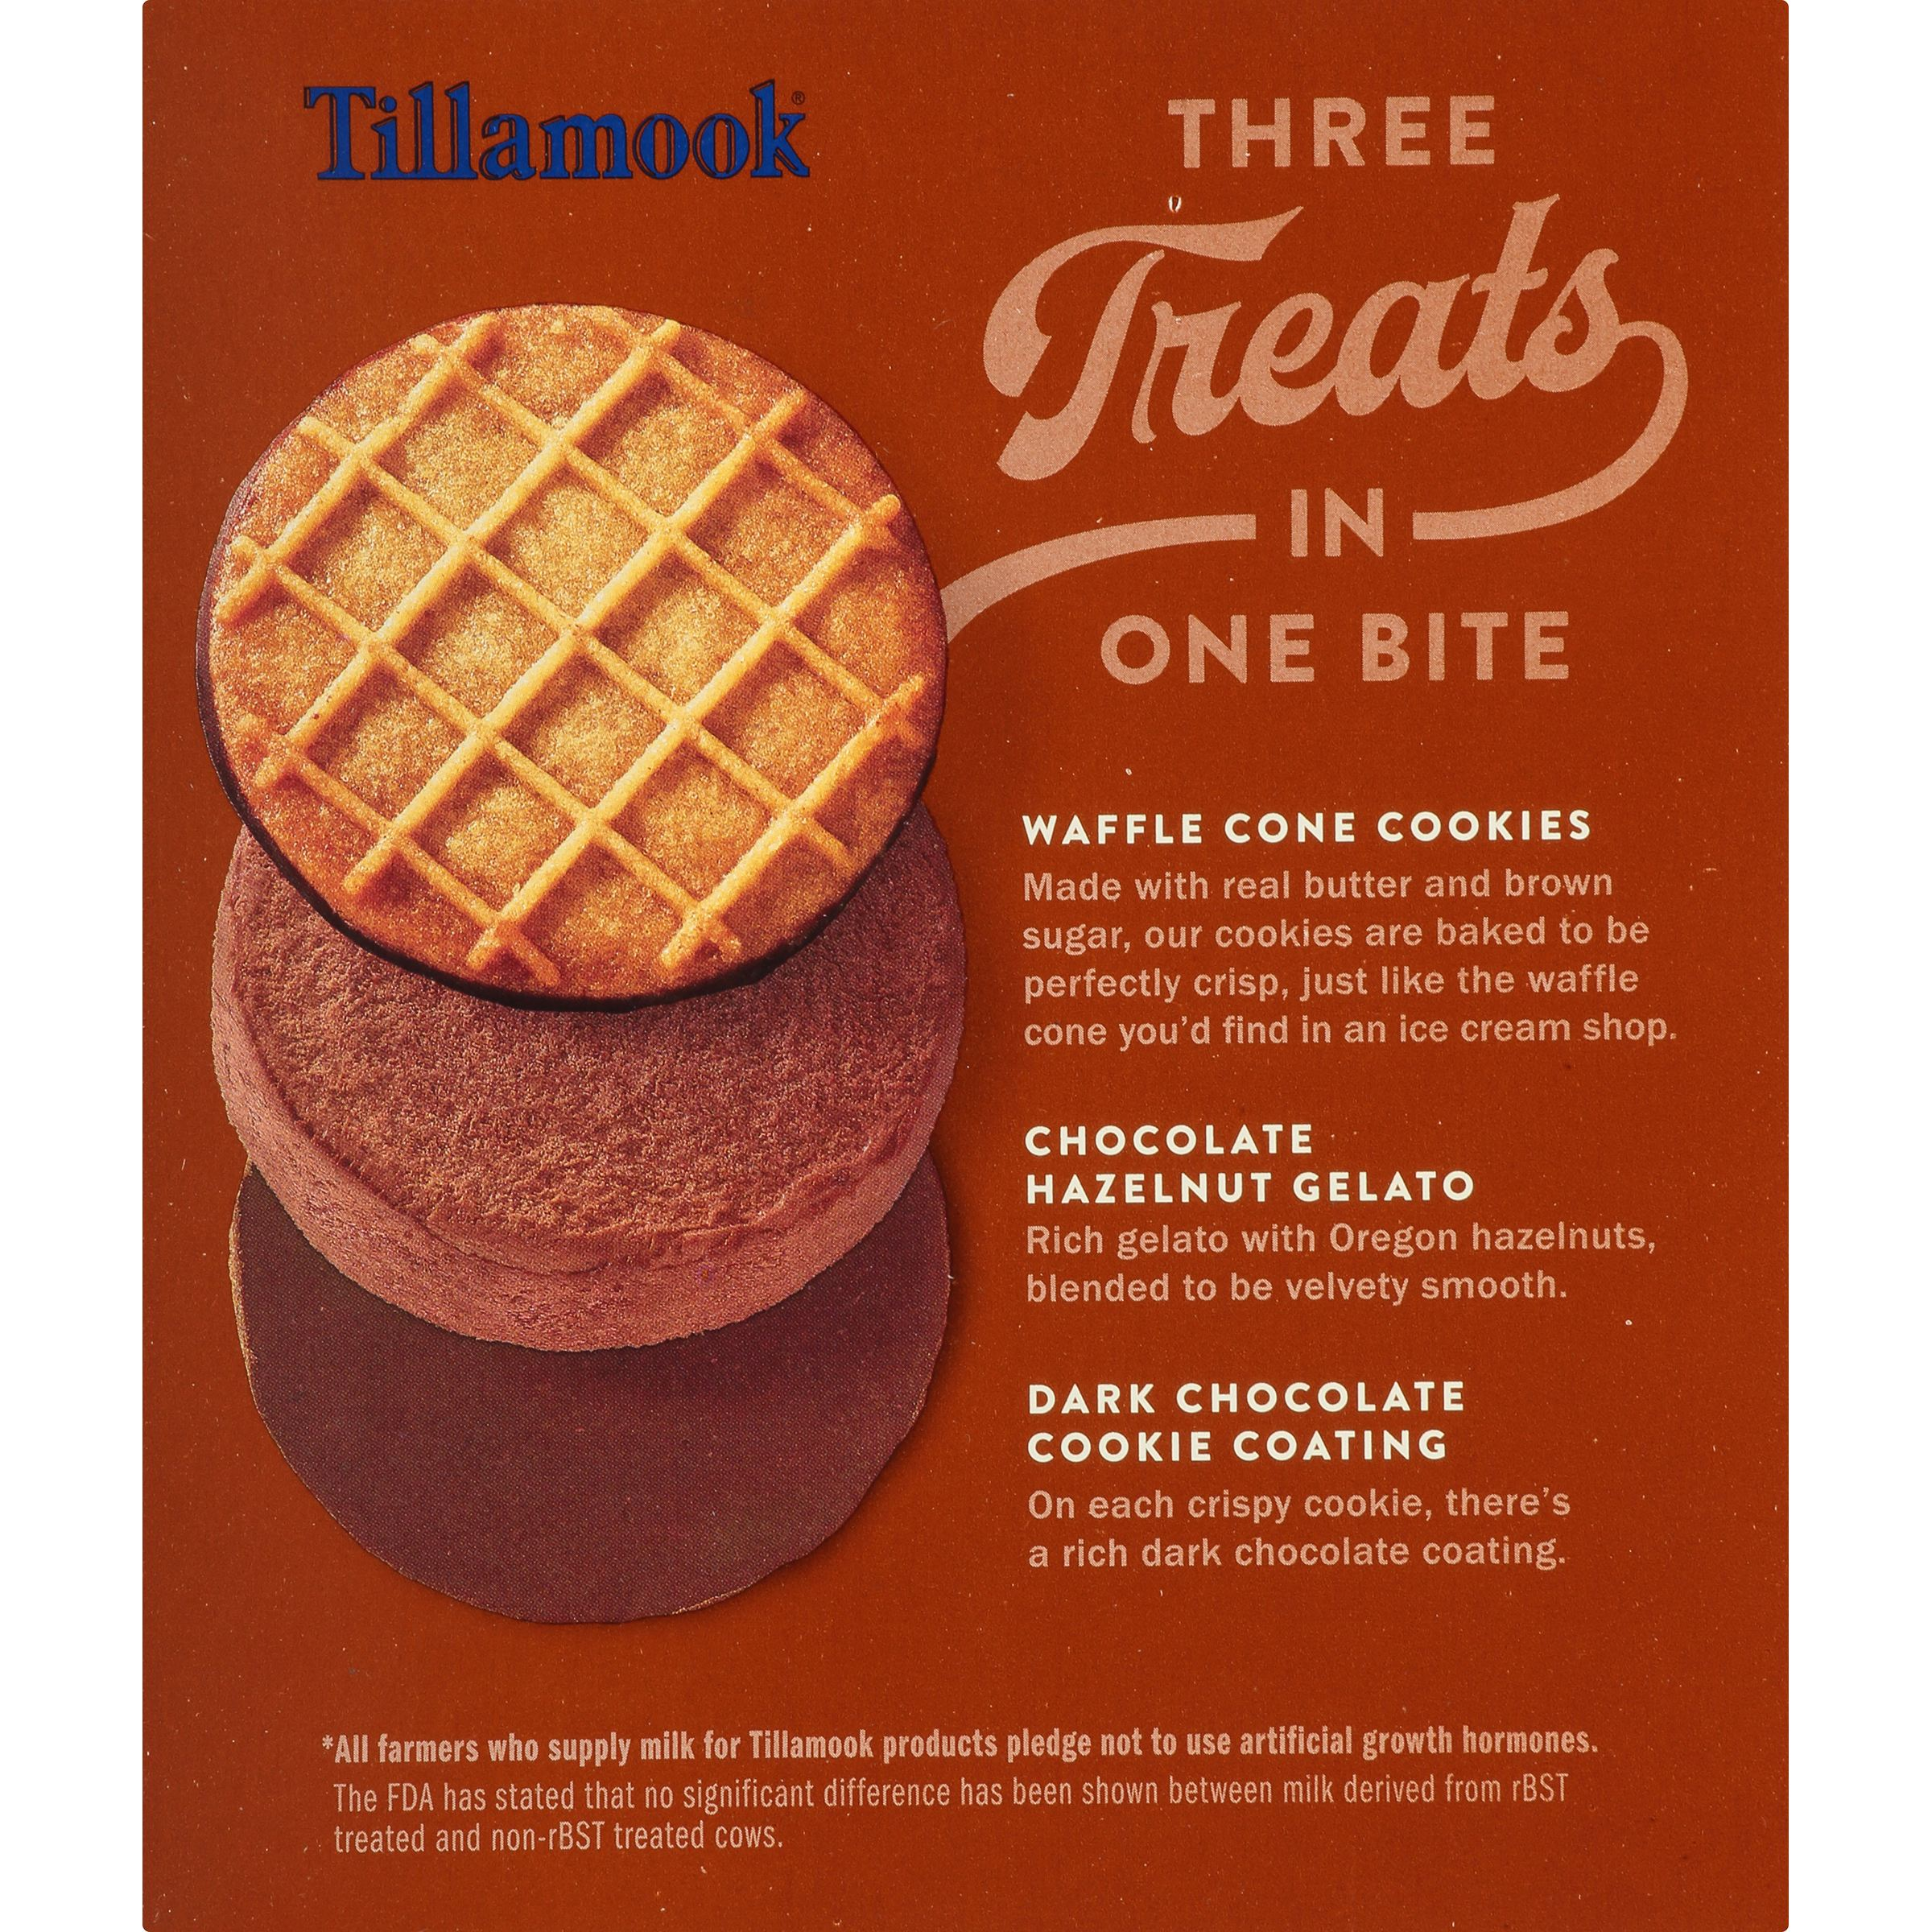 Tillamook Tillamookies Chocolate Hazelnut Really Creamy Gelato Sandwiches,  4  3.5 Oz Sandwiches   Walmart.com